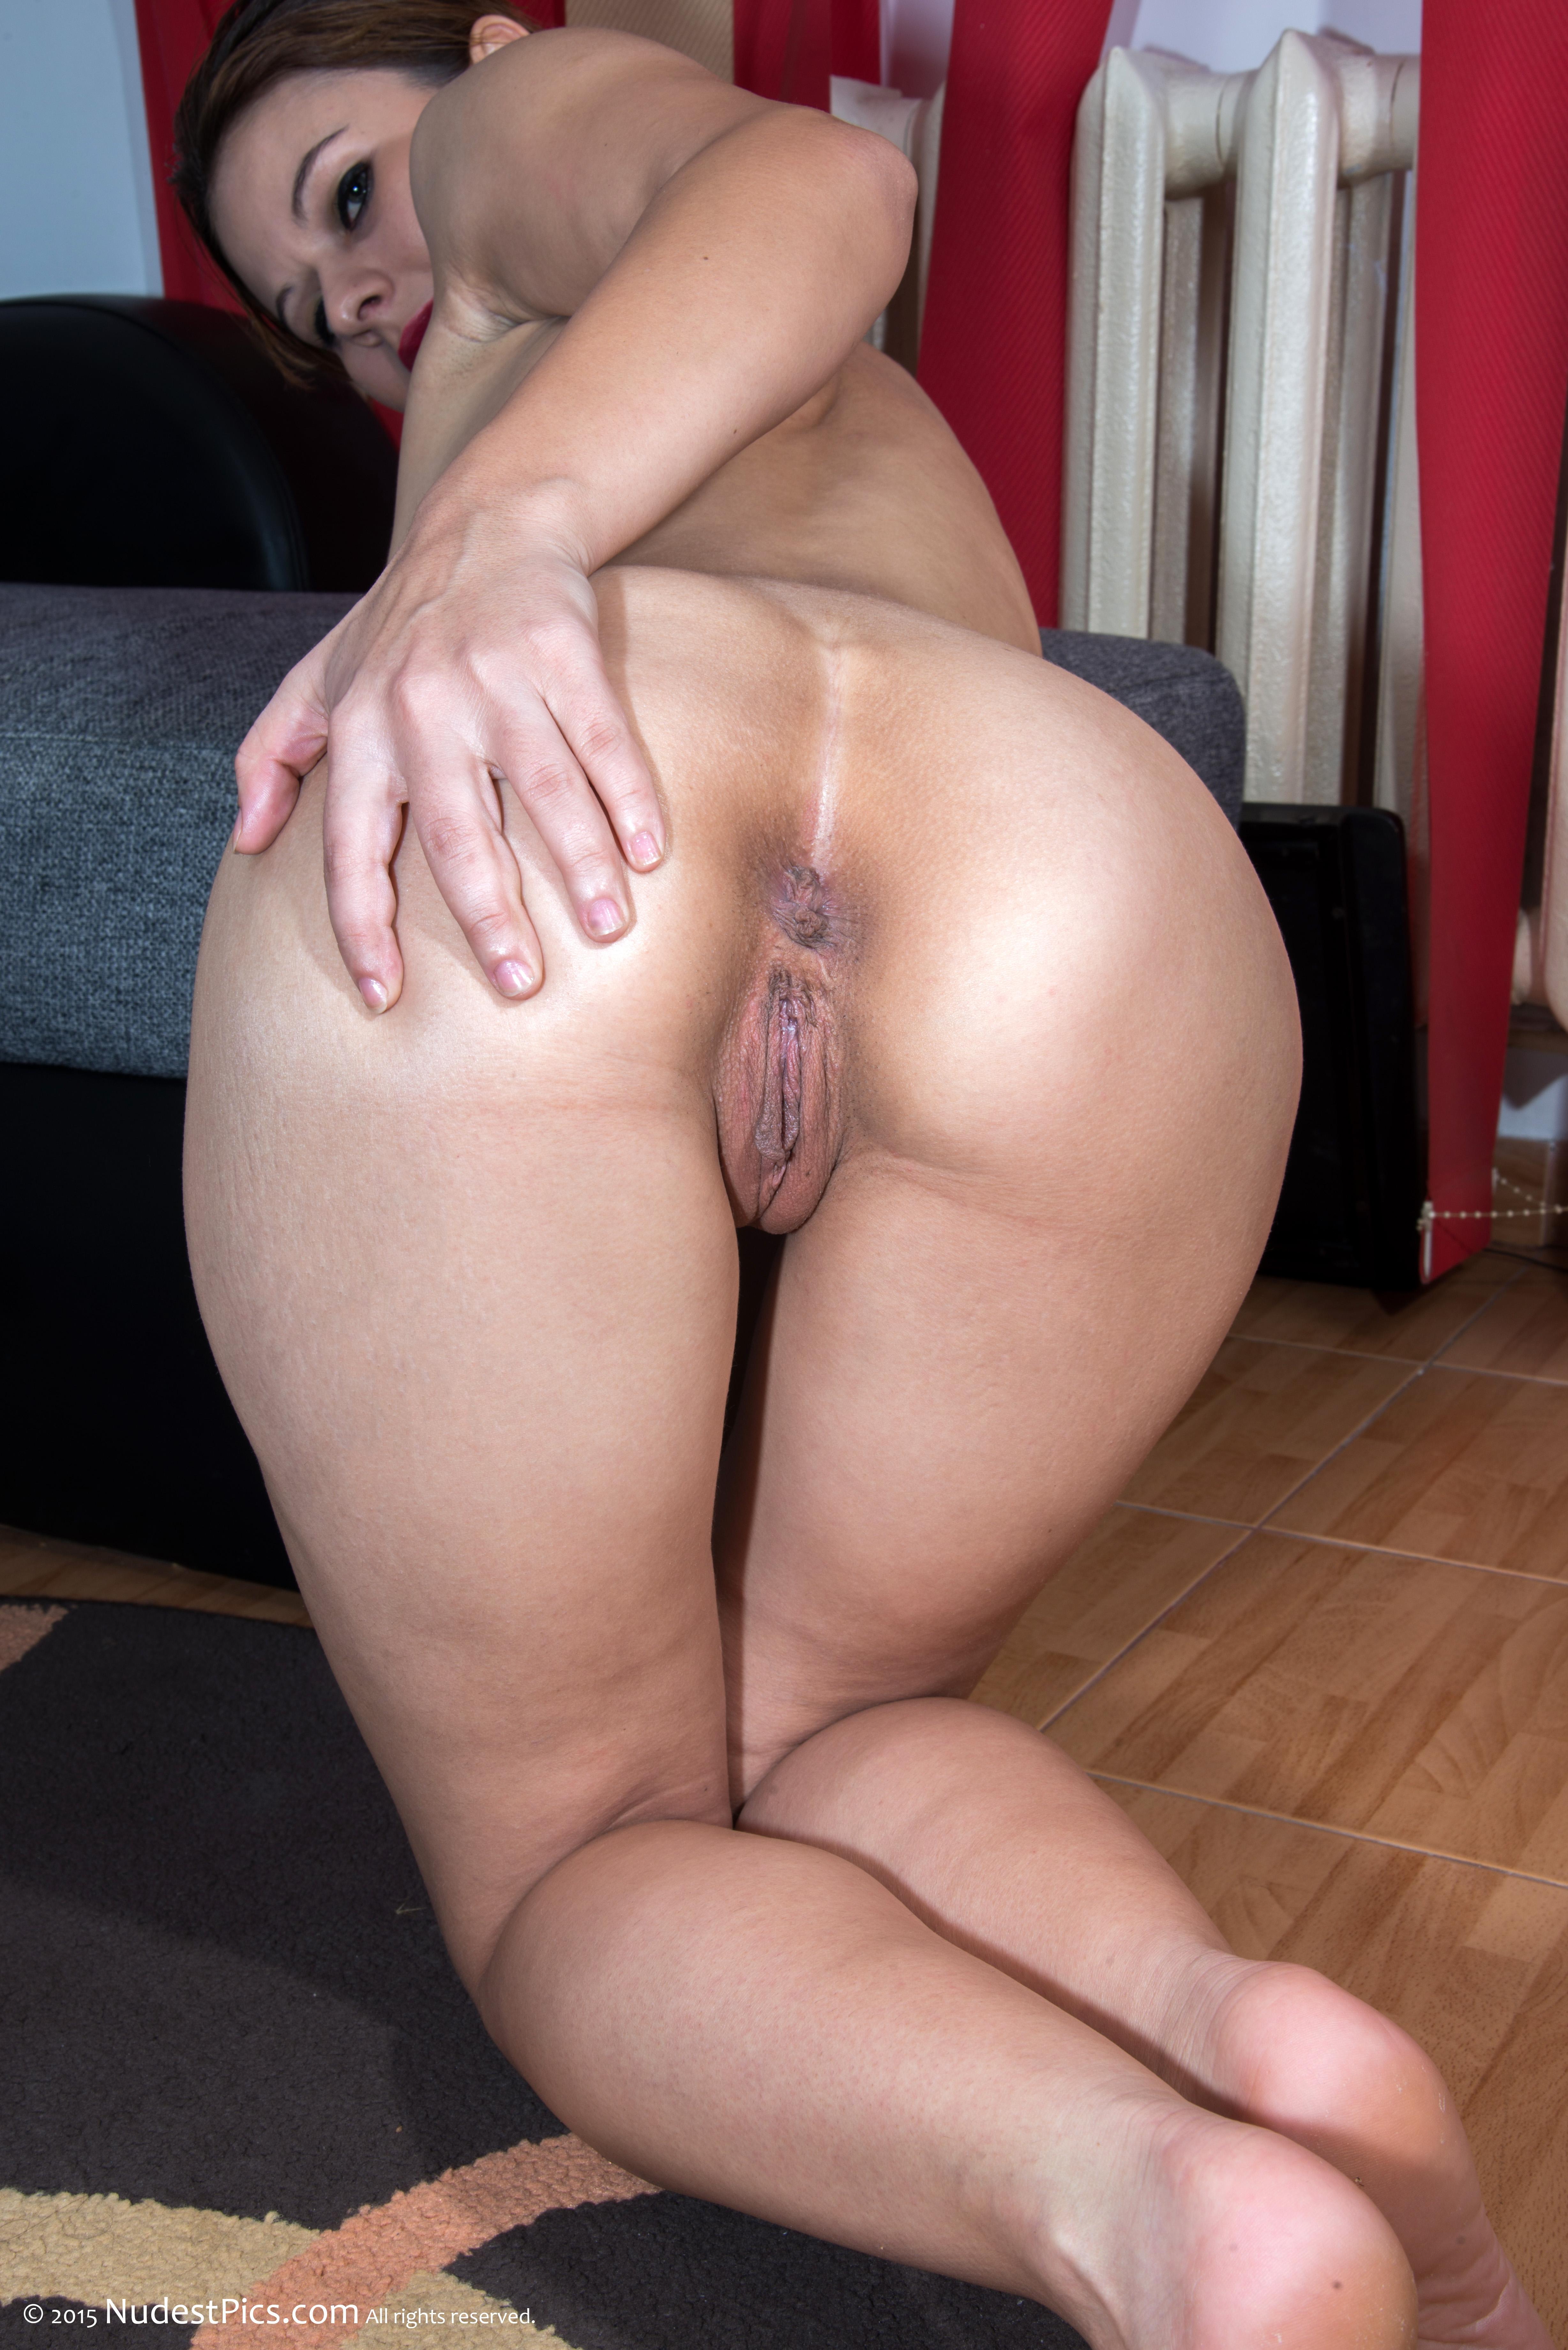 Italian women naked ass, free asain anal porn pics